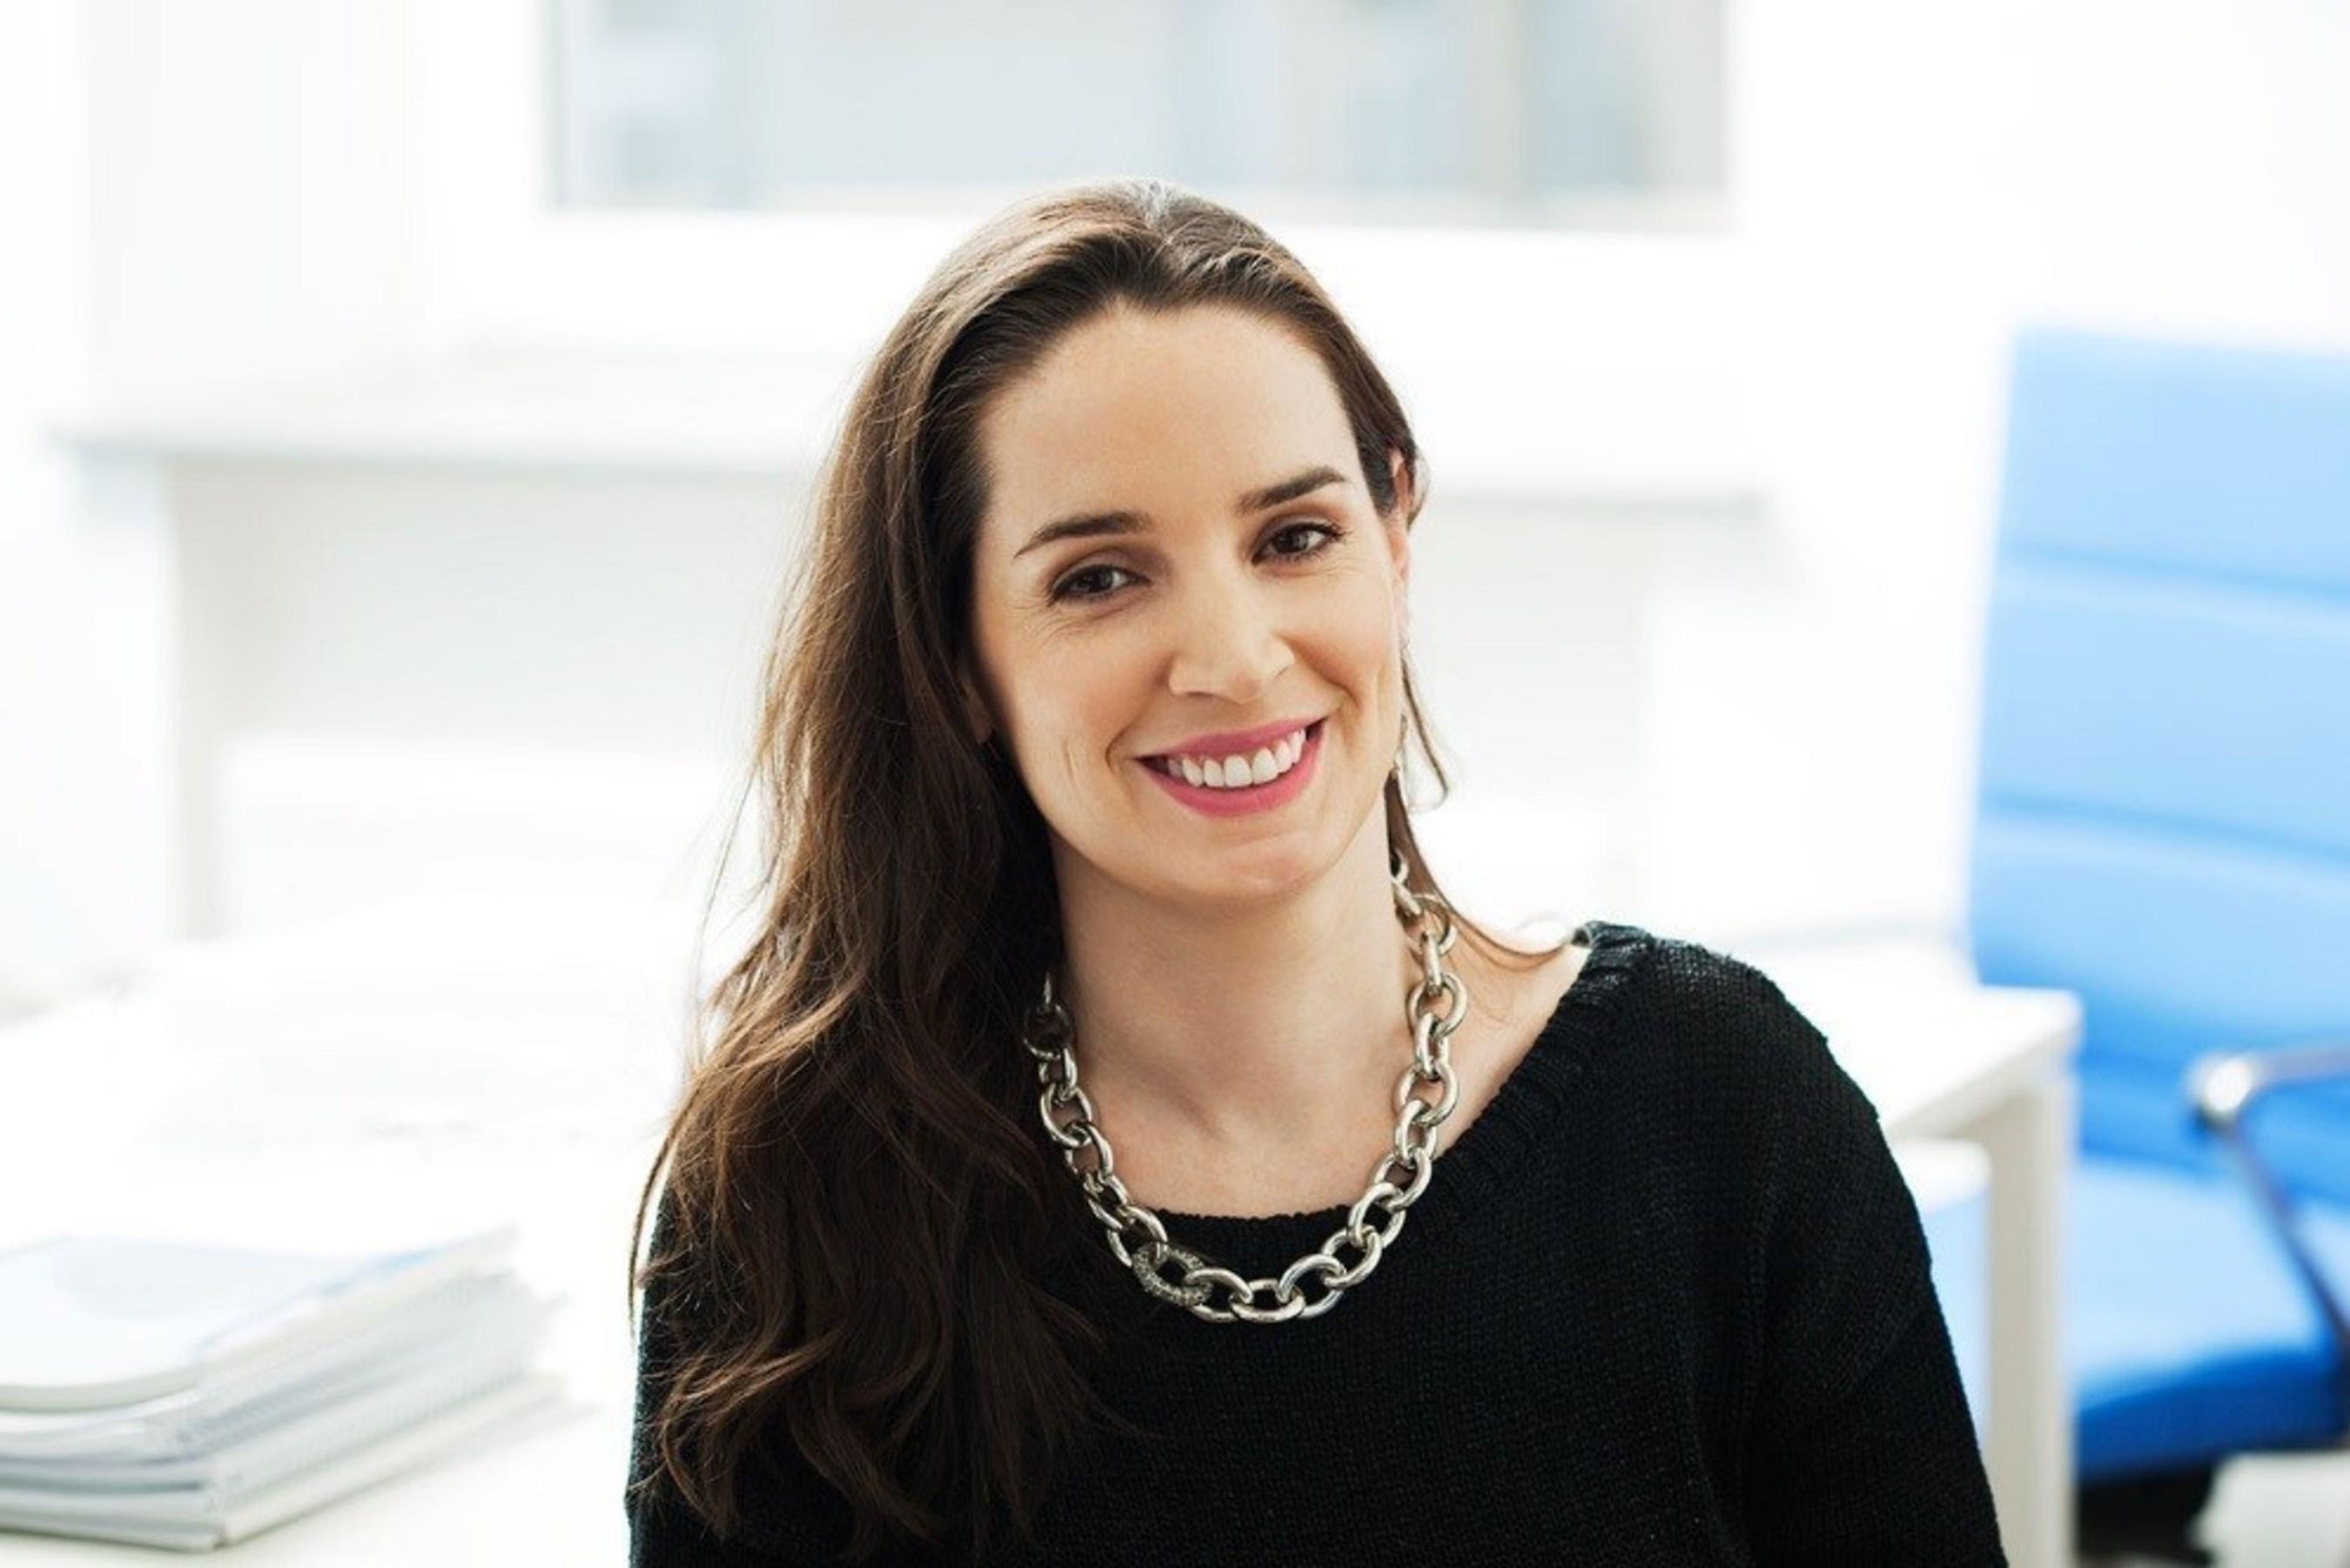 Maelle Gavet, Executive Vice President, Global Operations